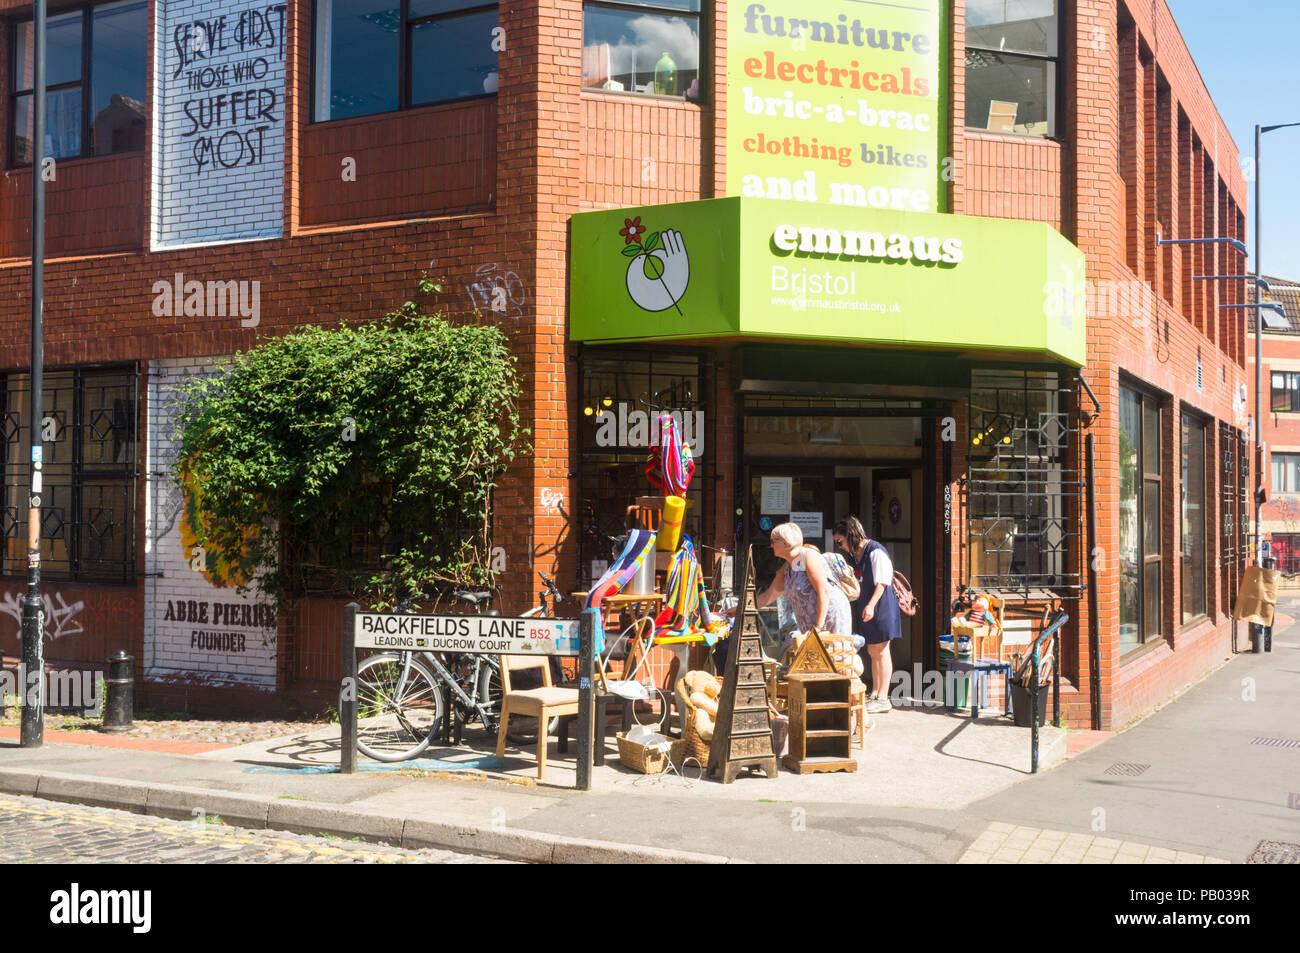 Emmaus secondhand shop, Bristol, UK - Stock Image